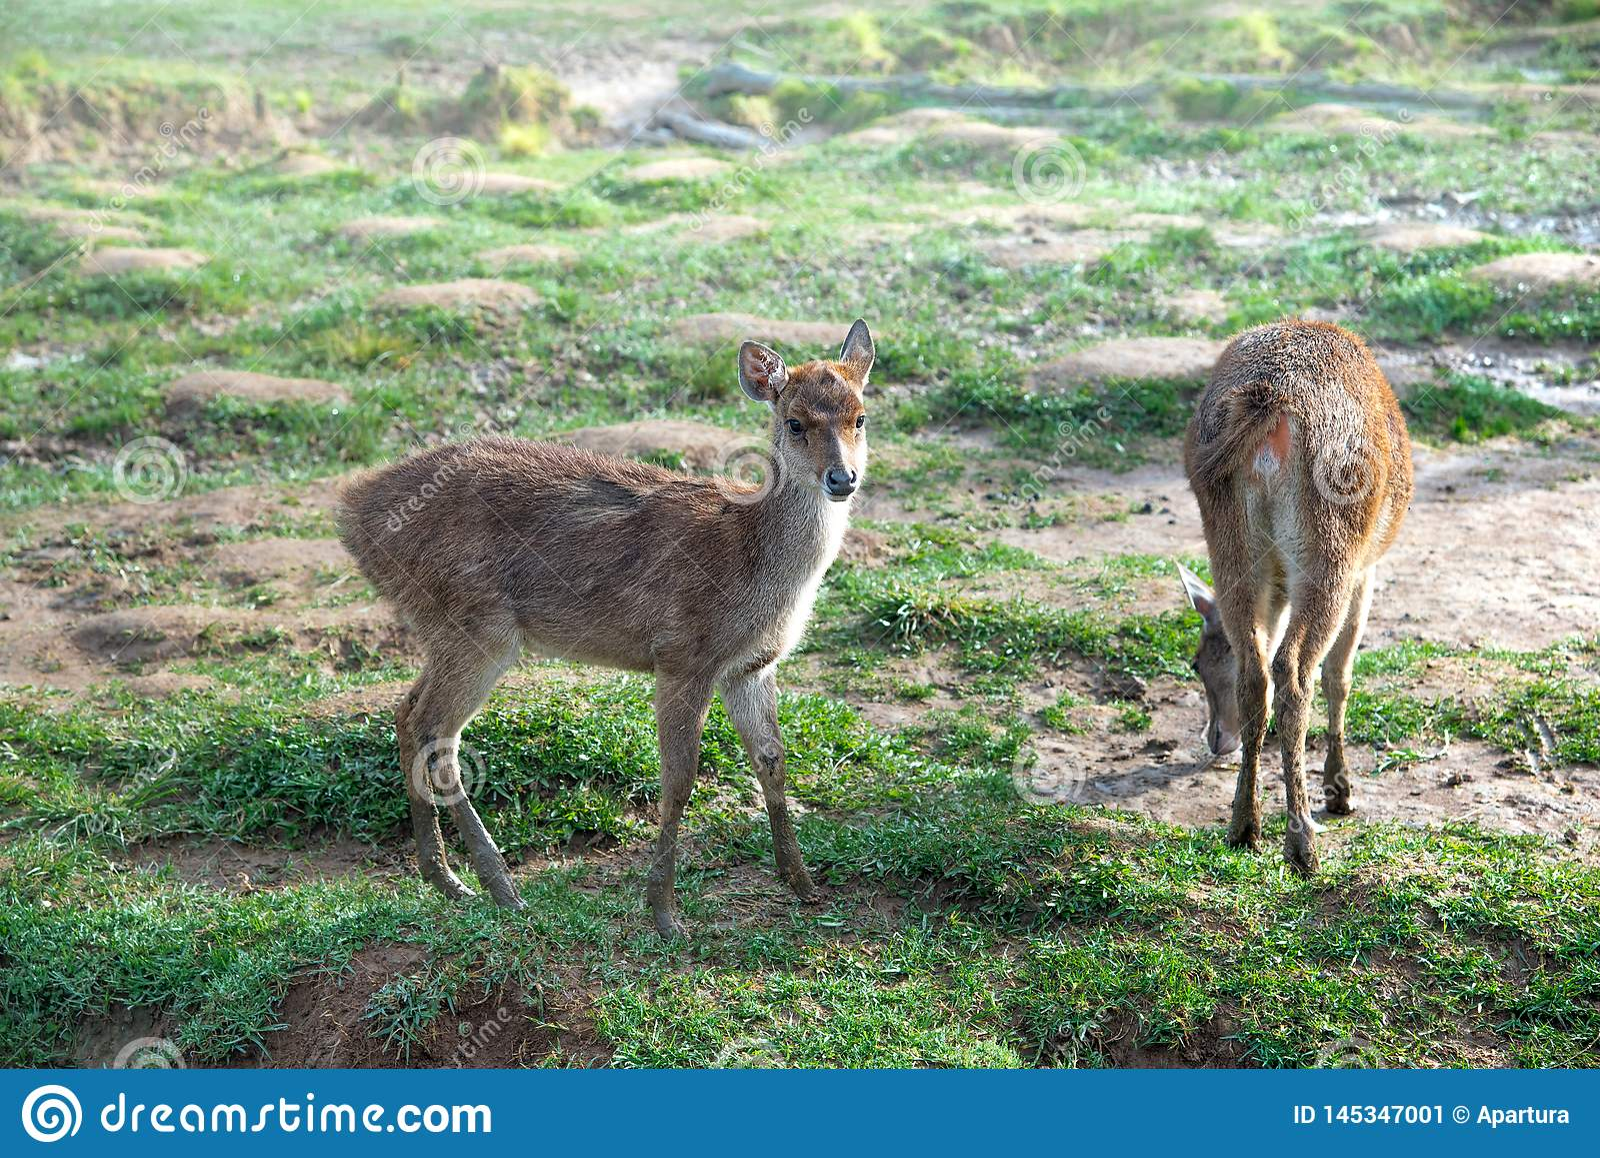 Kleine Herten of Damhinde op Groene Weiland of Weide of Weide in Misty Morning During Sunrise Het Hert is zonder Geweitakken